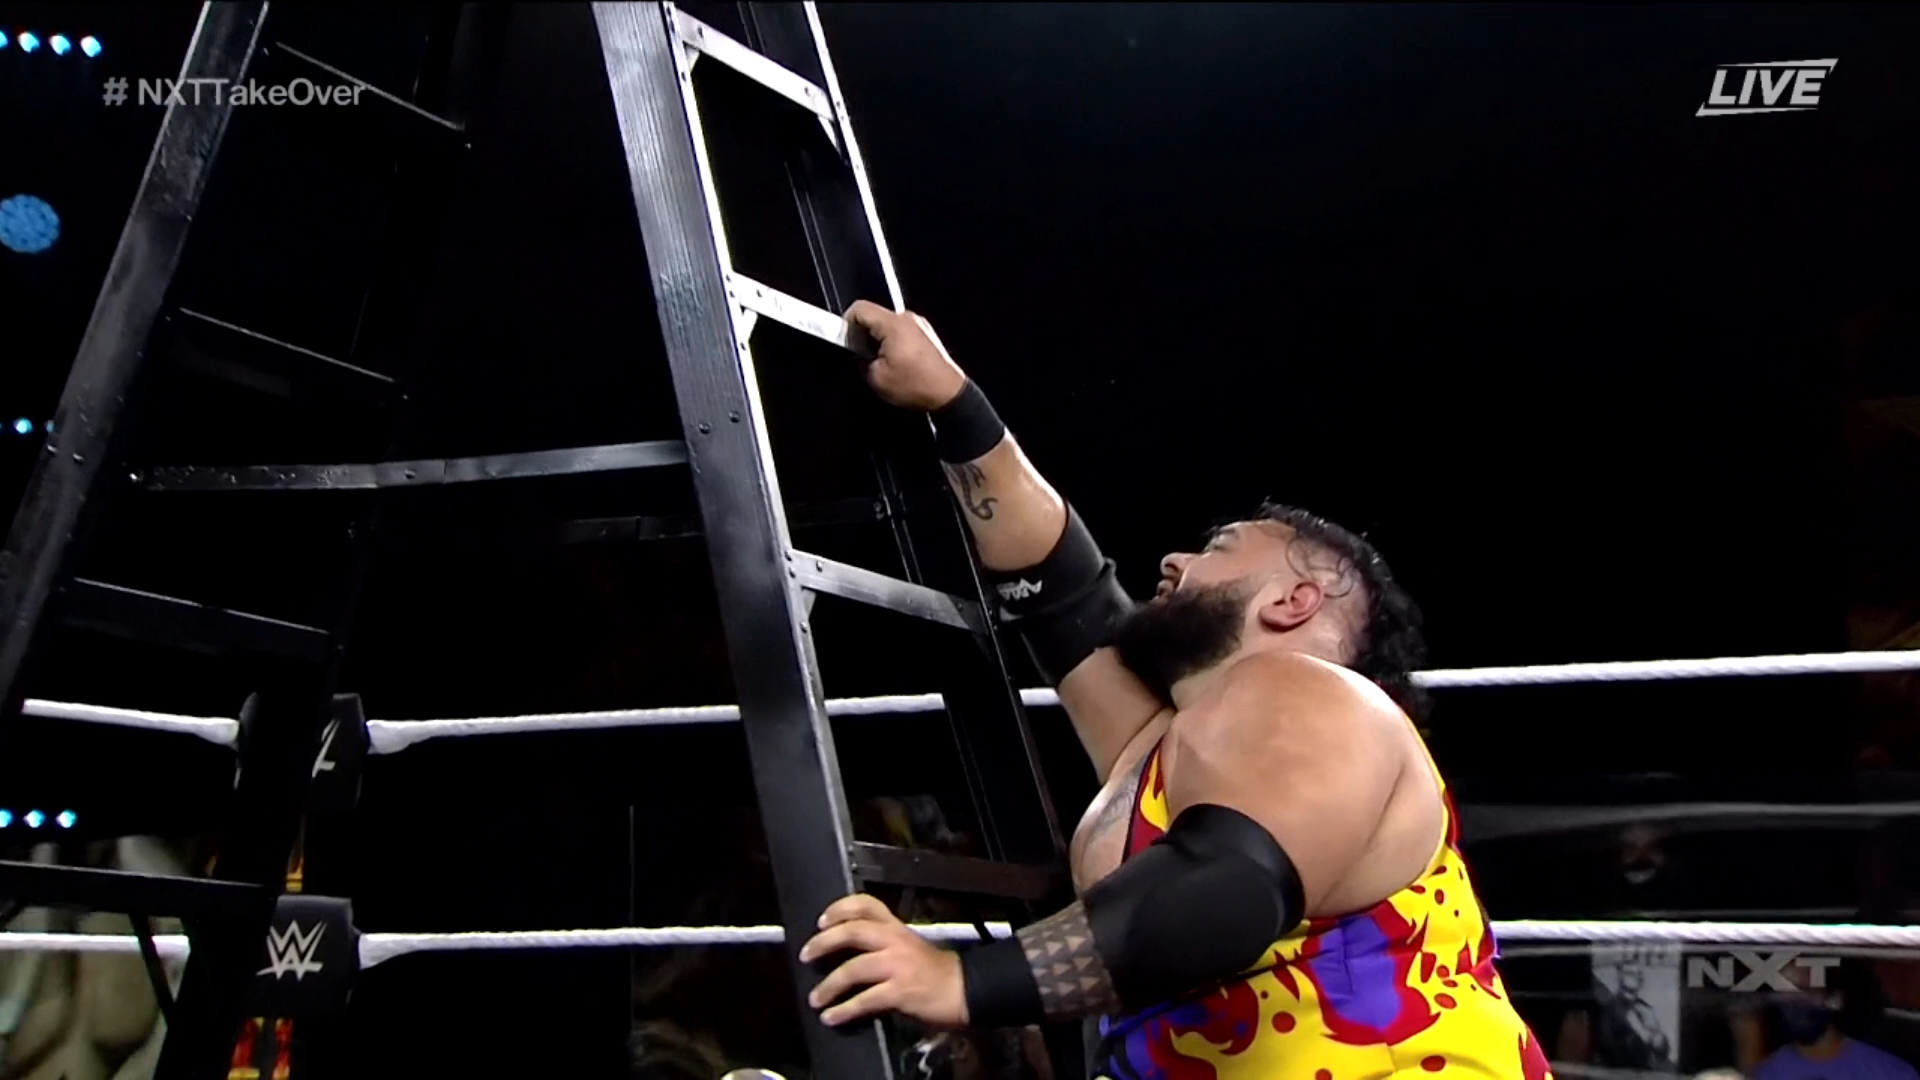 WWE NXT TakeOver XXX 2020 1080p WEBRip x264-WH